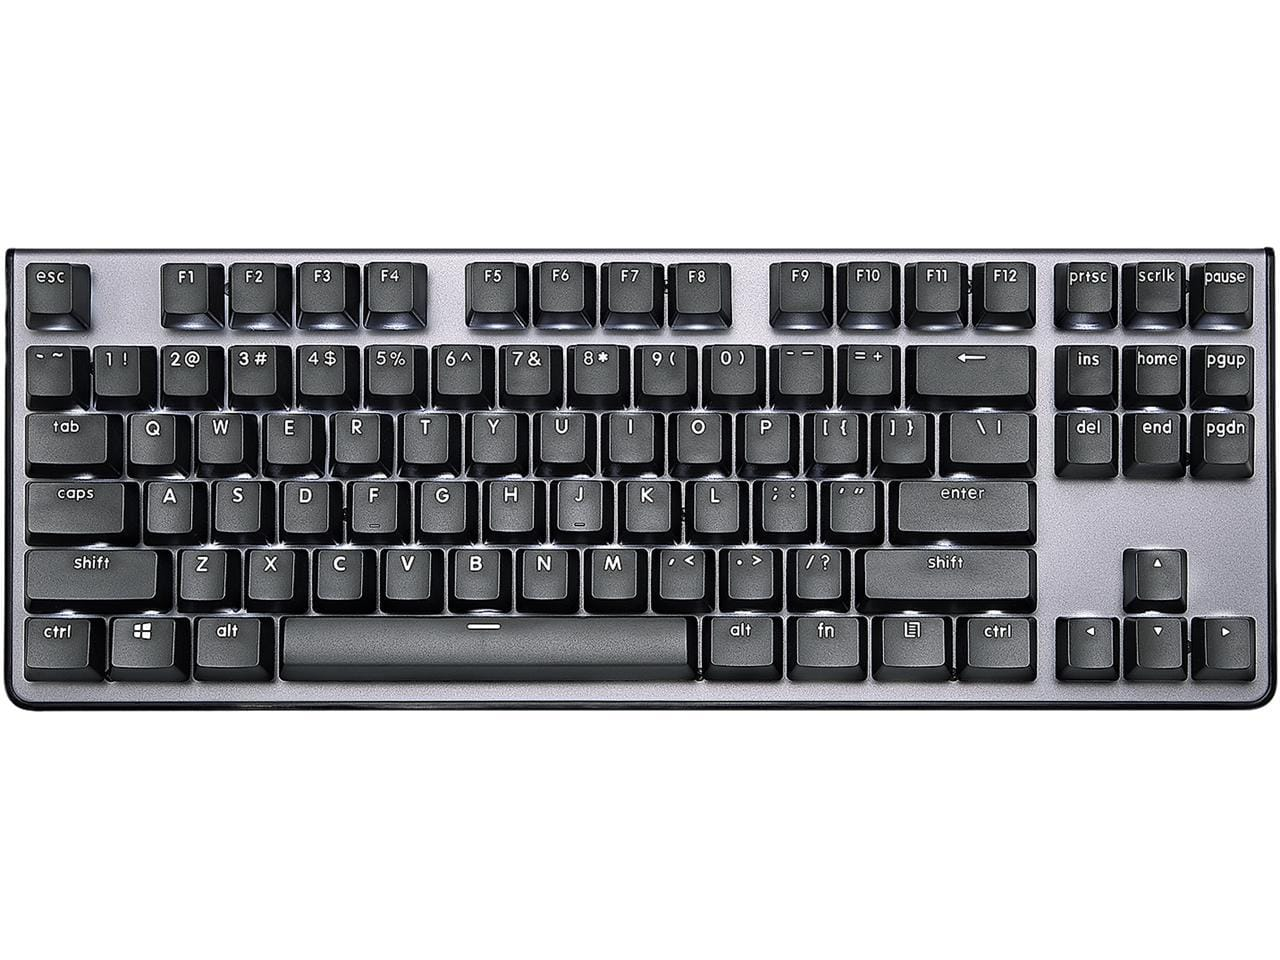 G.Skill KM360 Tenkeyless Mechanical Keyboard (Blk) w/ Cherry MX Switches @Newegg $44